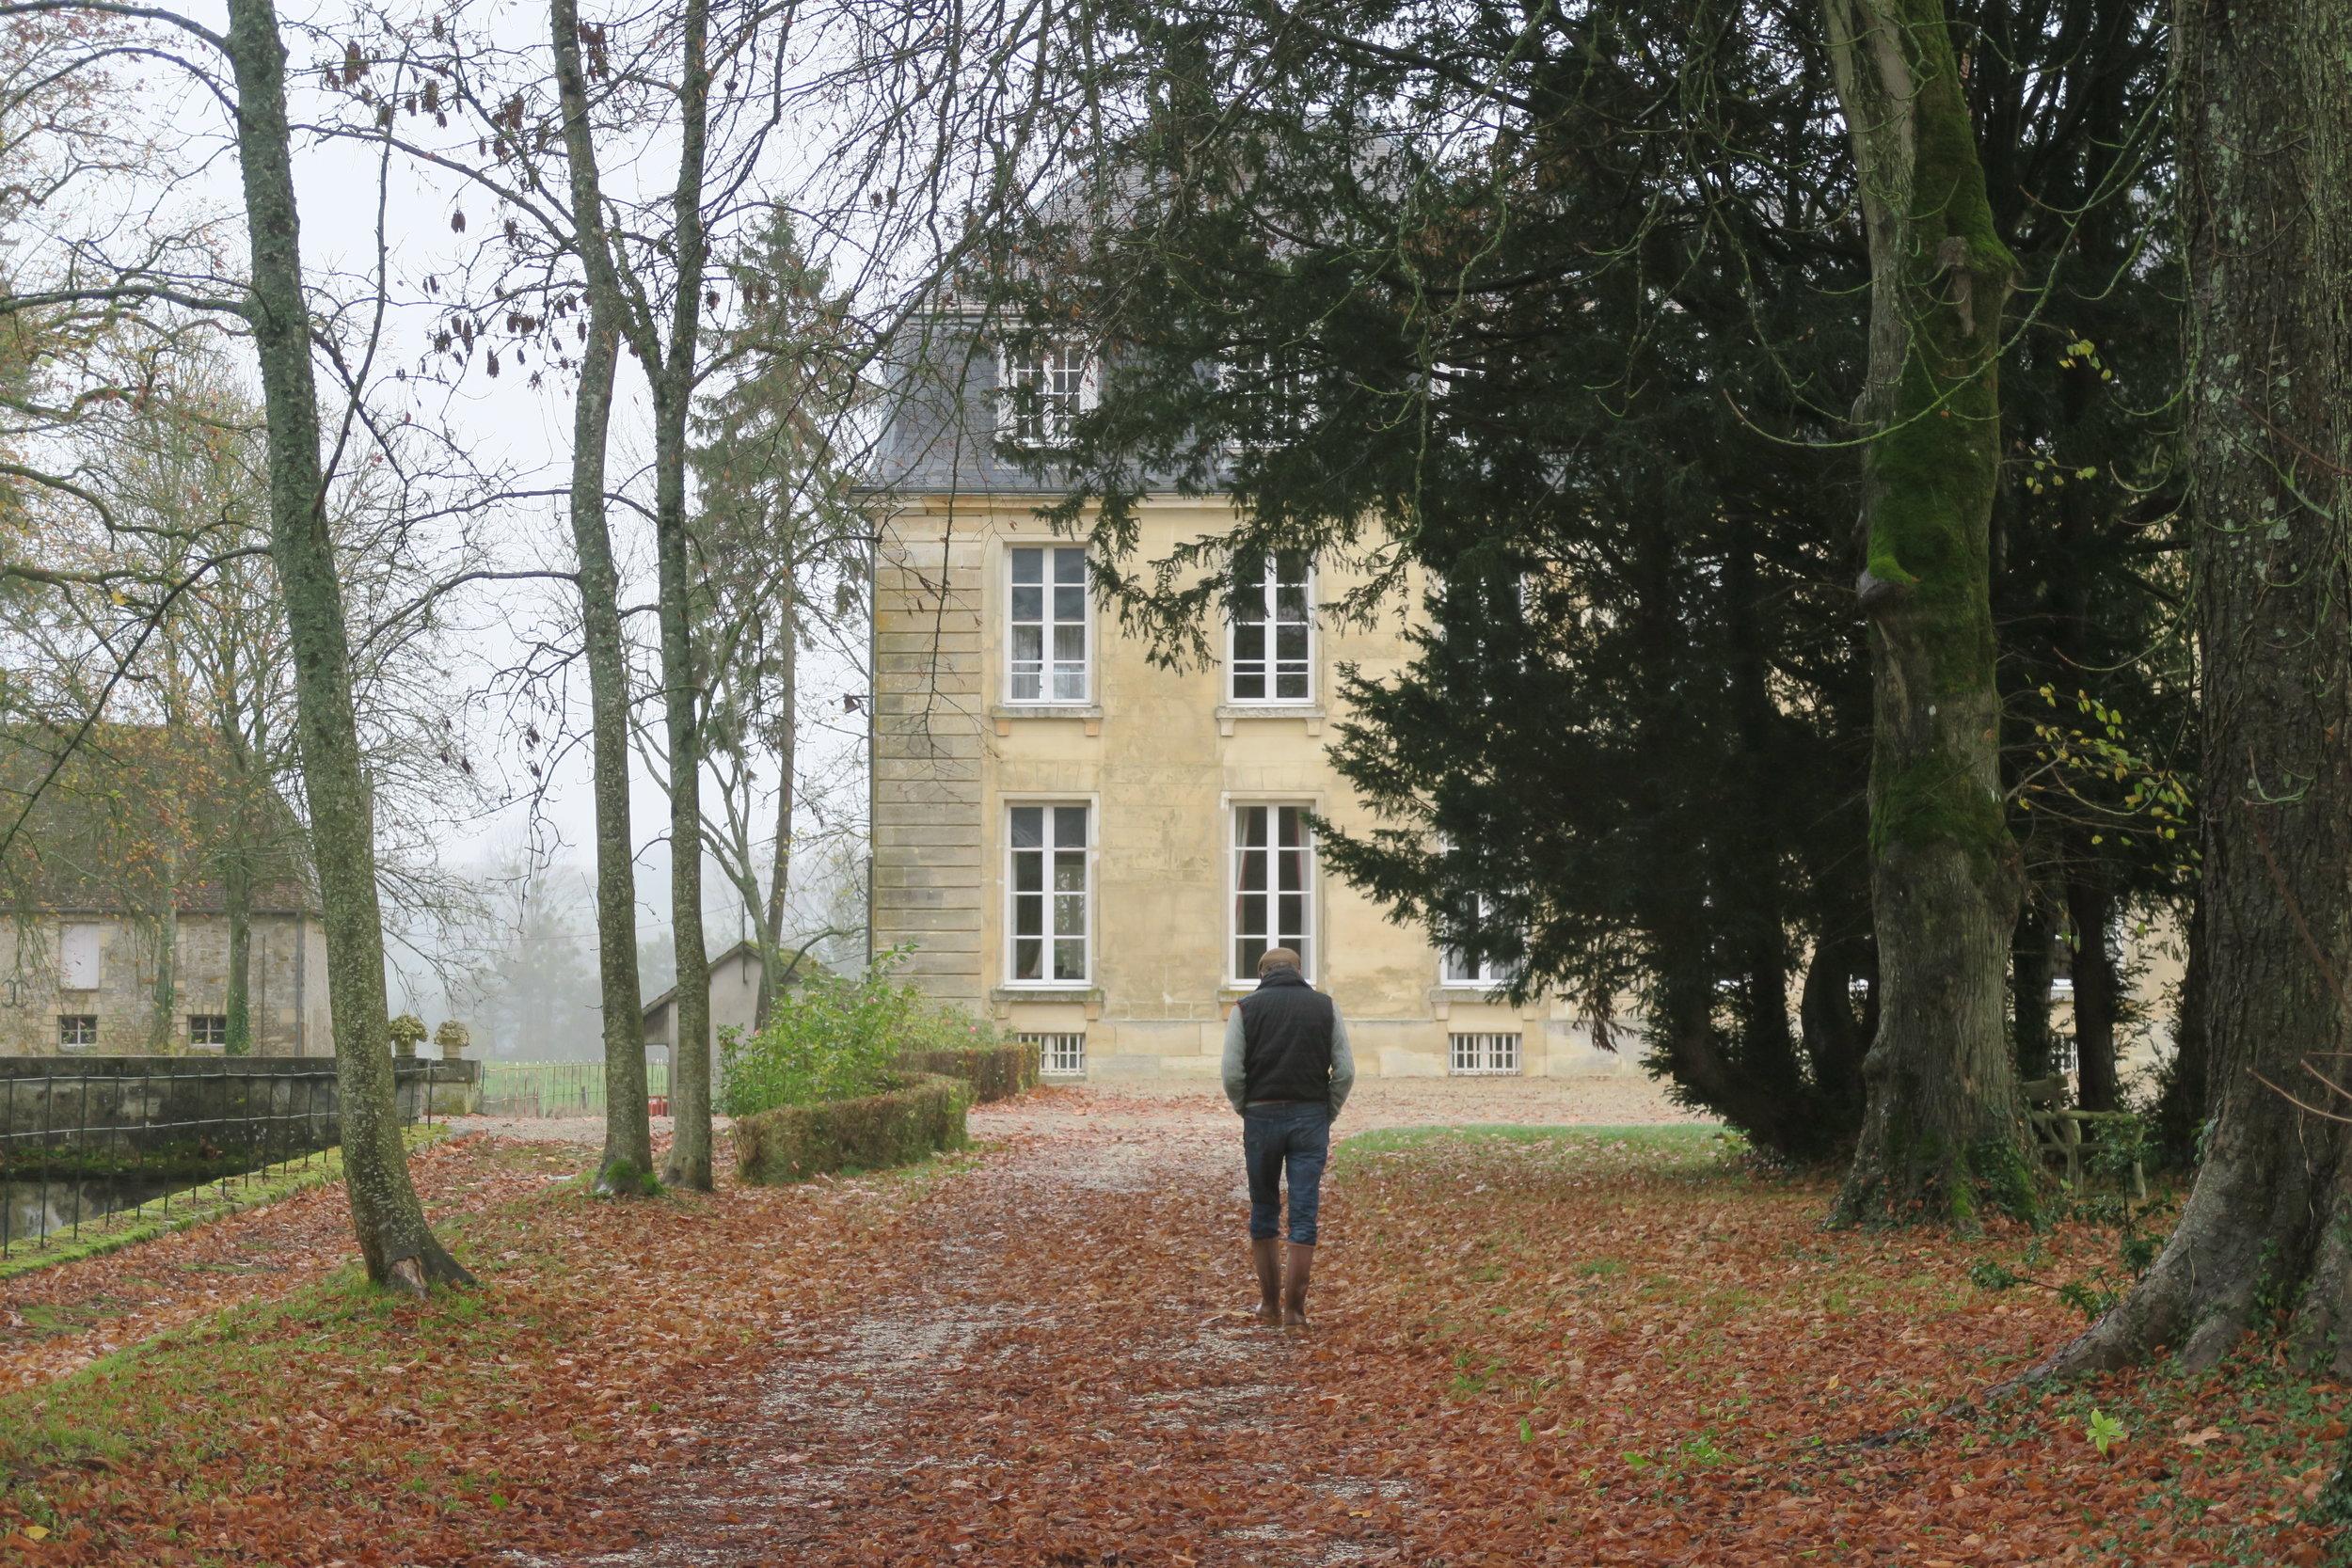 The allée leading to the Chateau.